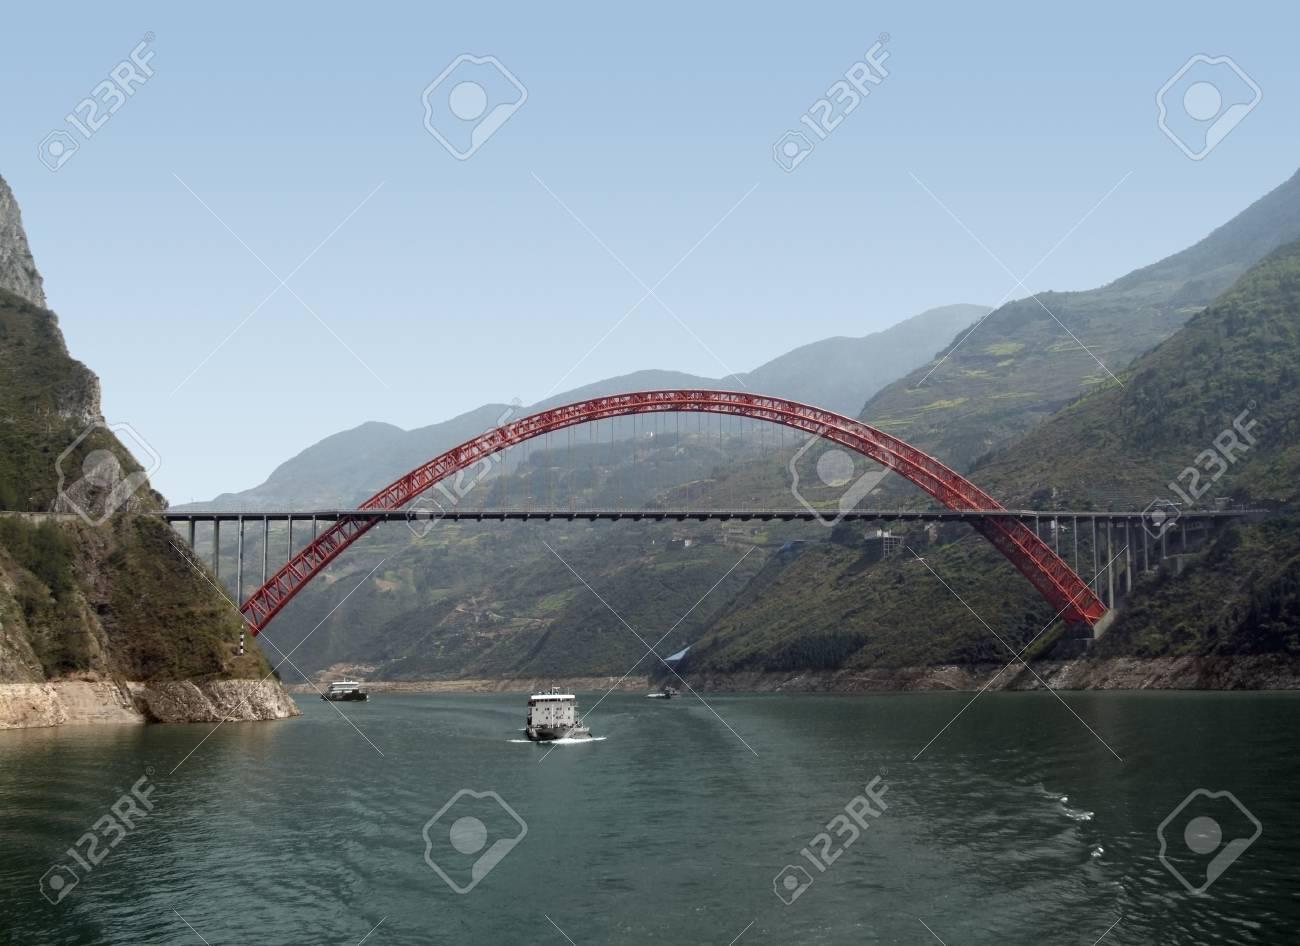 sunny scenery along the Yangtze River in China including bridge and ships Stock Photo - 10968486